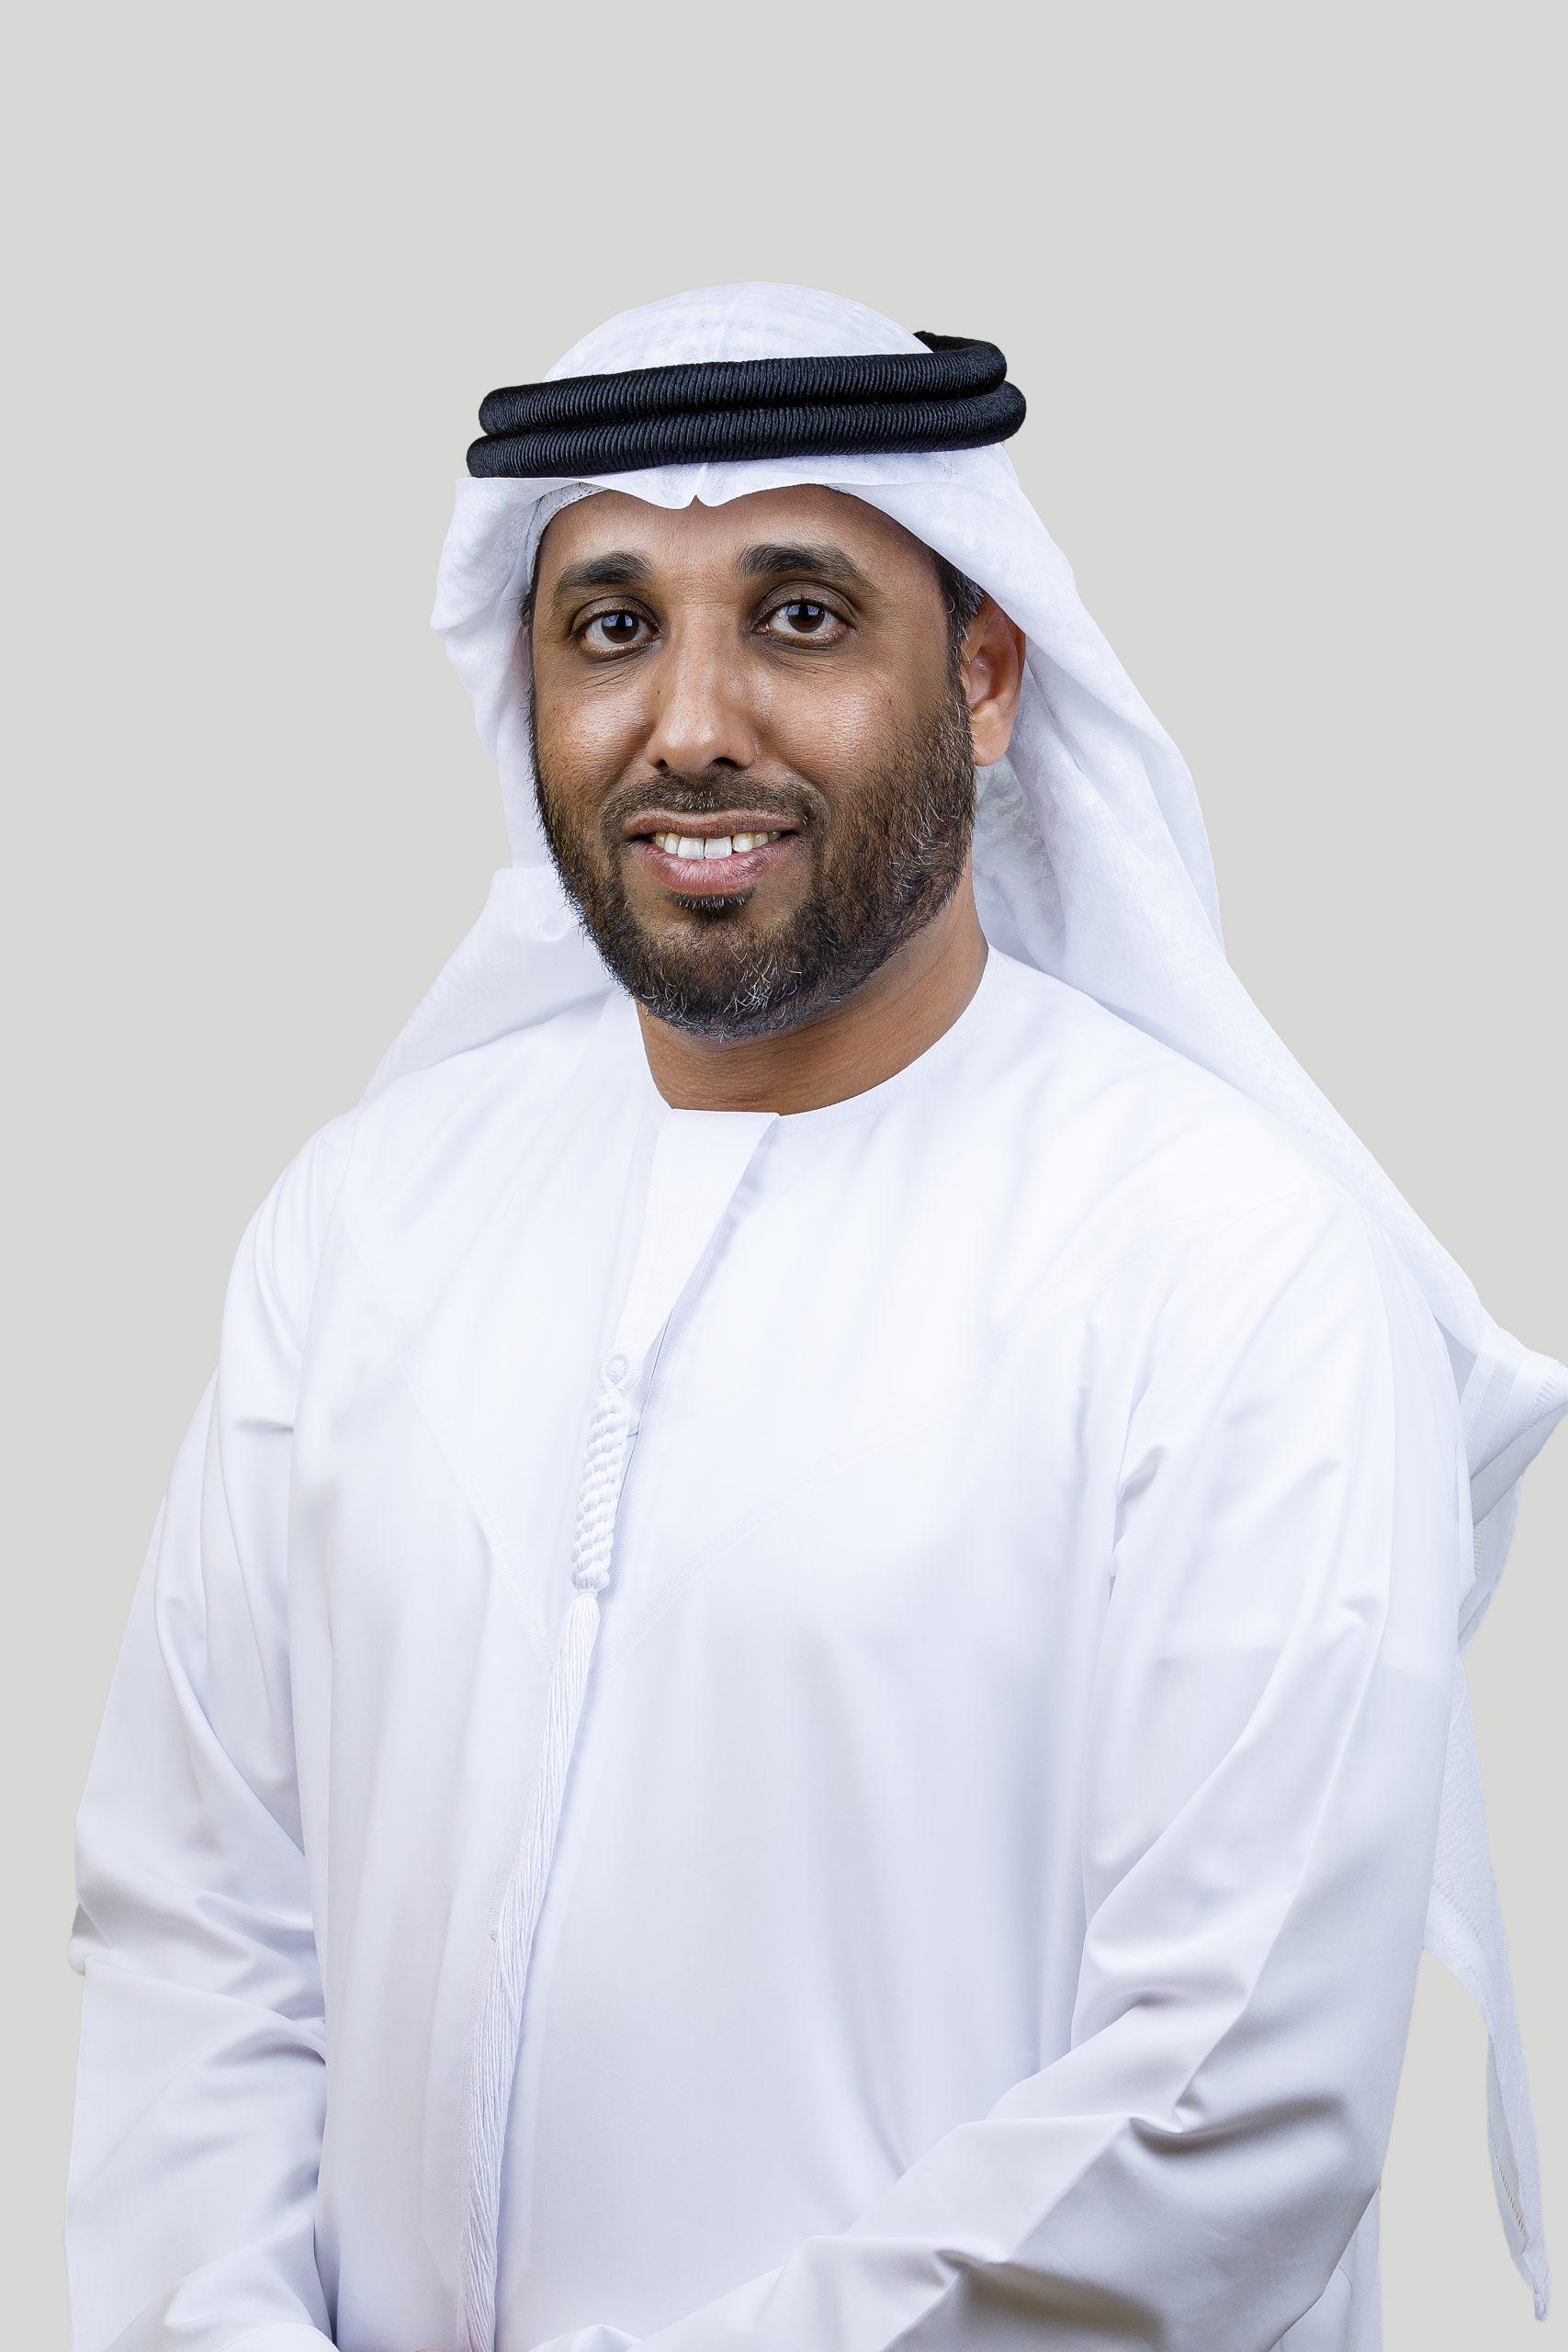 Dr. Mohammed Sheikh Abdallah